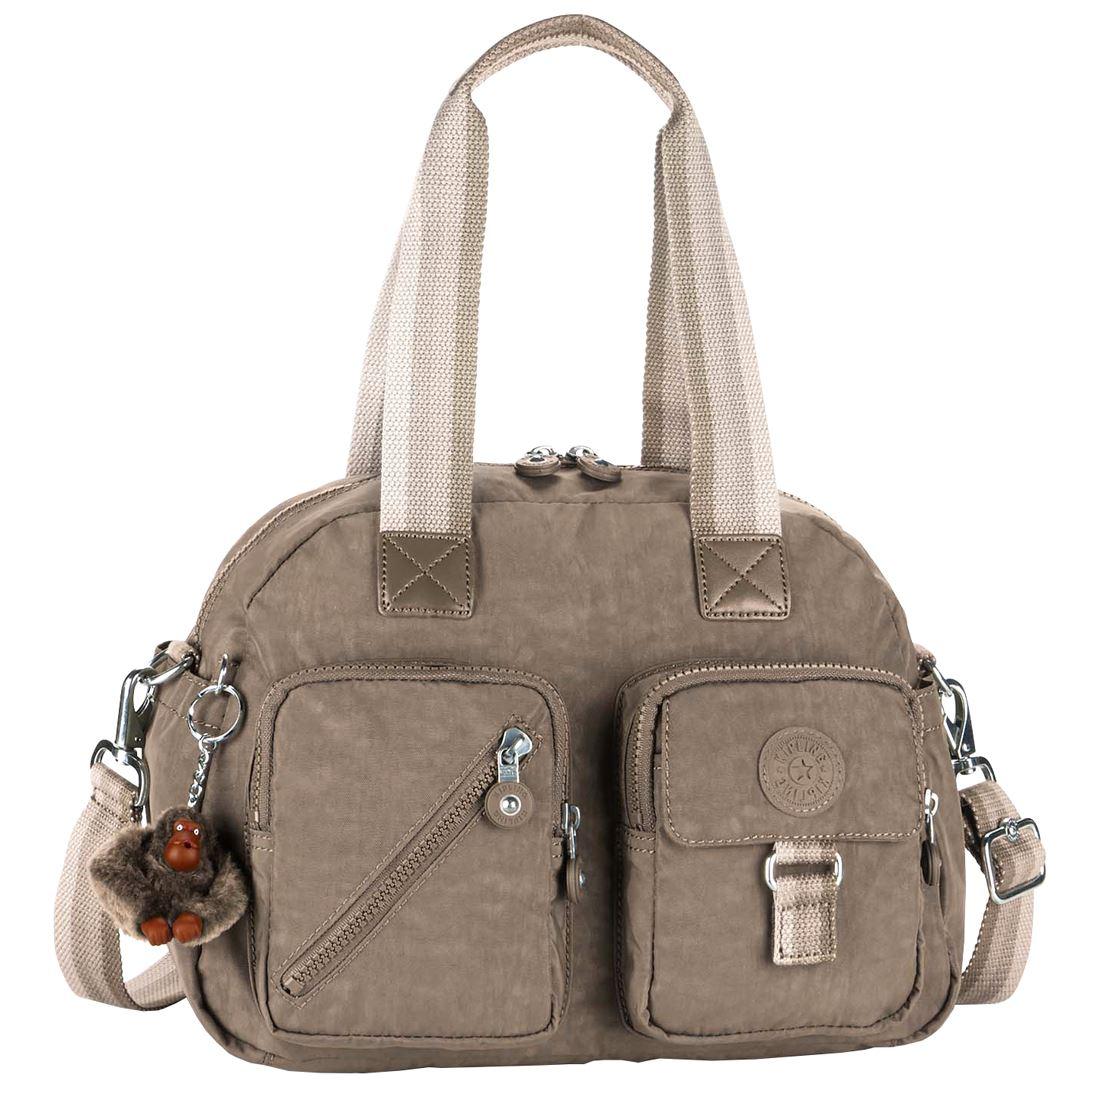 Model Kipling Gabbie Ladies Medium Shoulder Bag / Cross Body Handbag | EBay